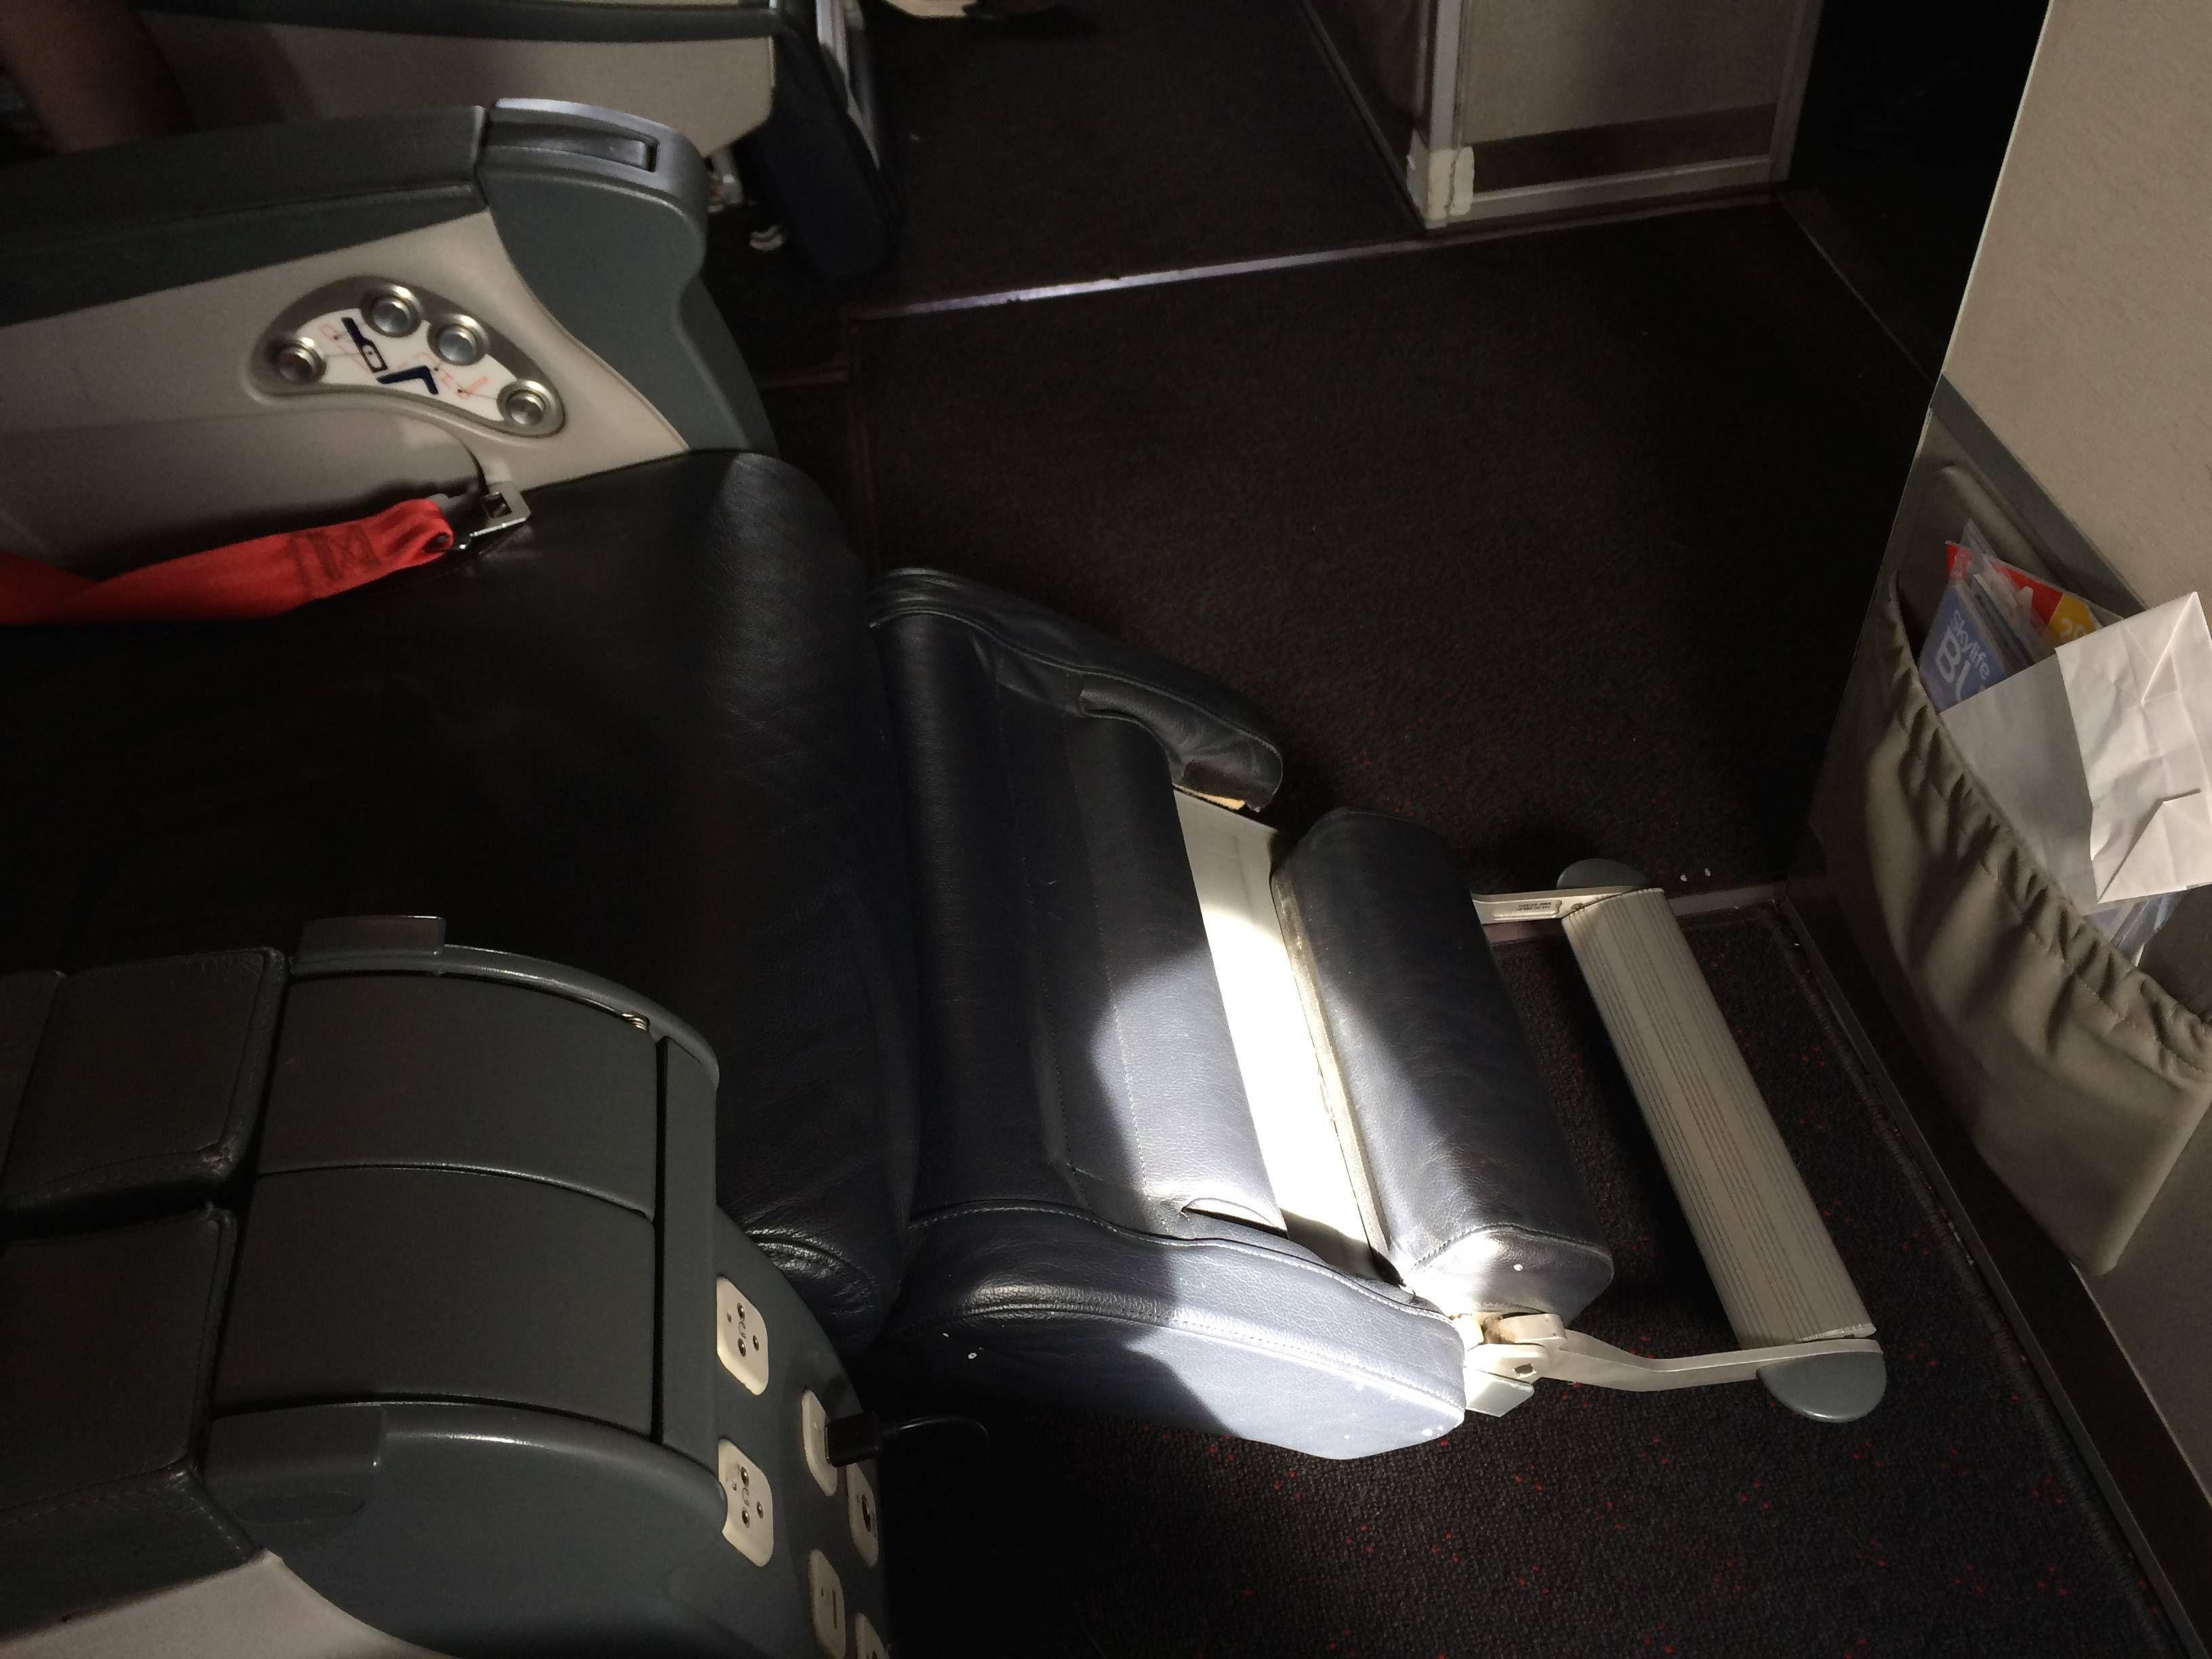 Turkish Airlines BUsiness Class Executiva A321 - passageirodeprimeira